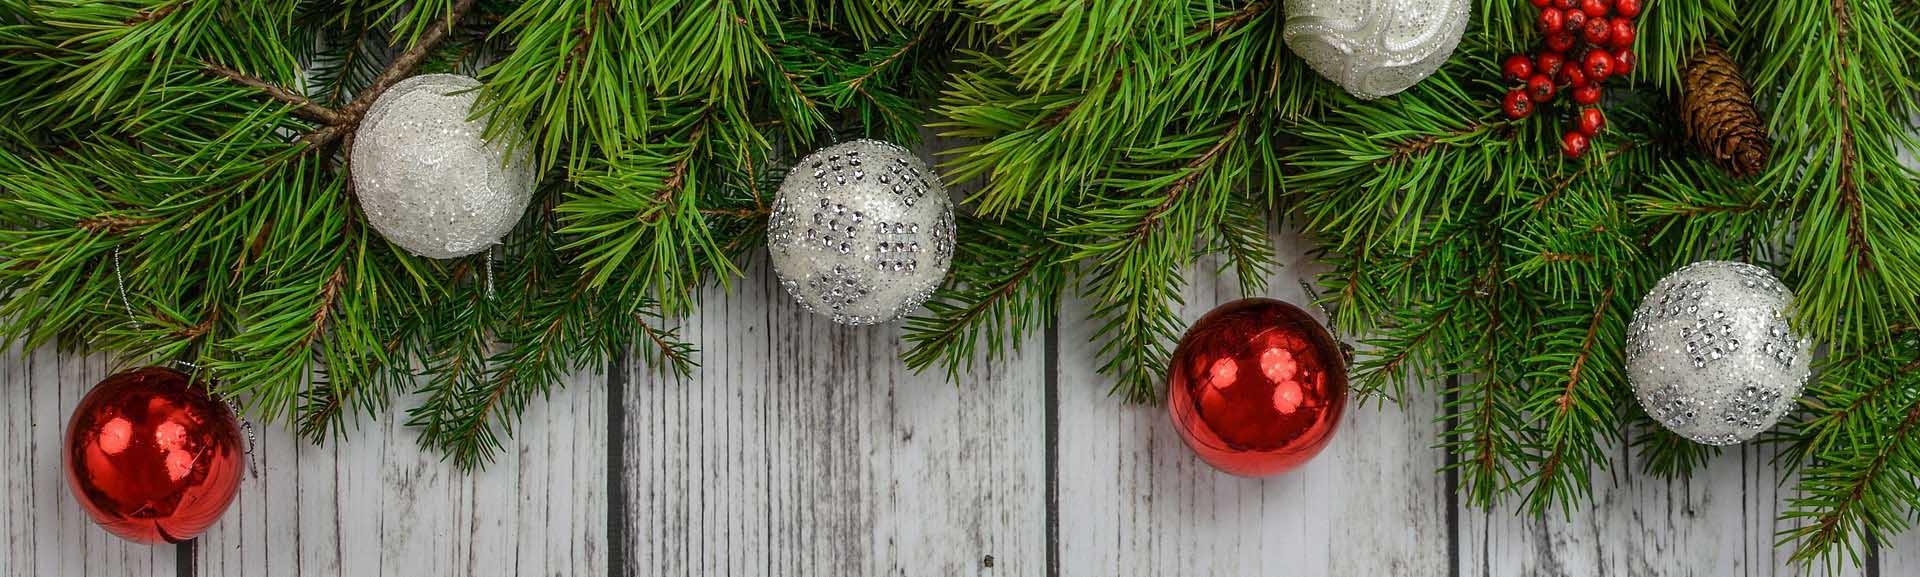 Kerst-Da-Tano-Italiaanse Smaak